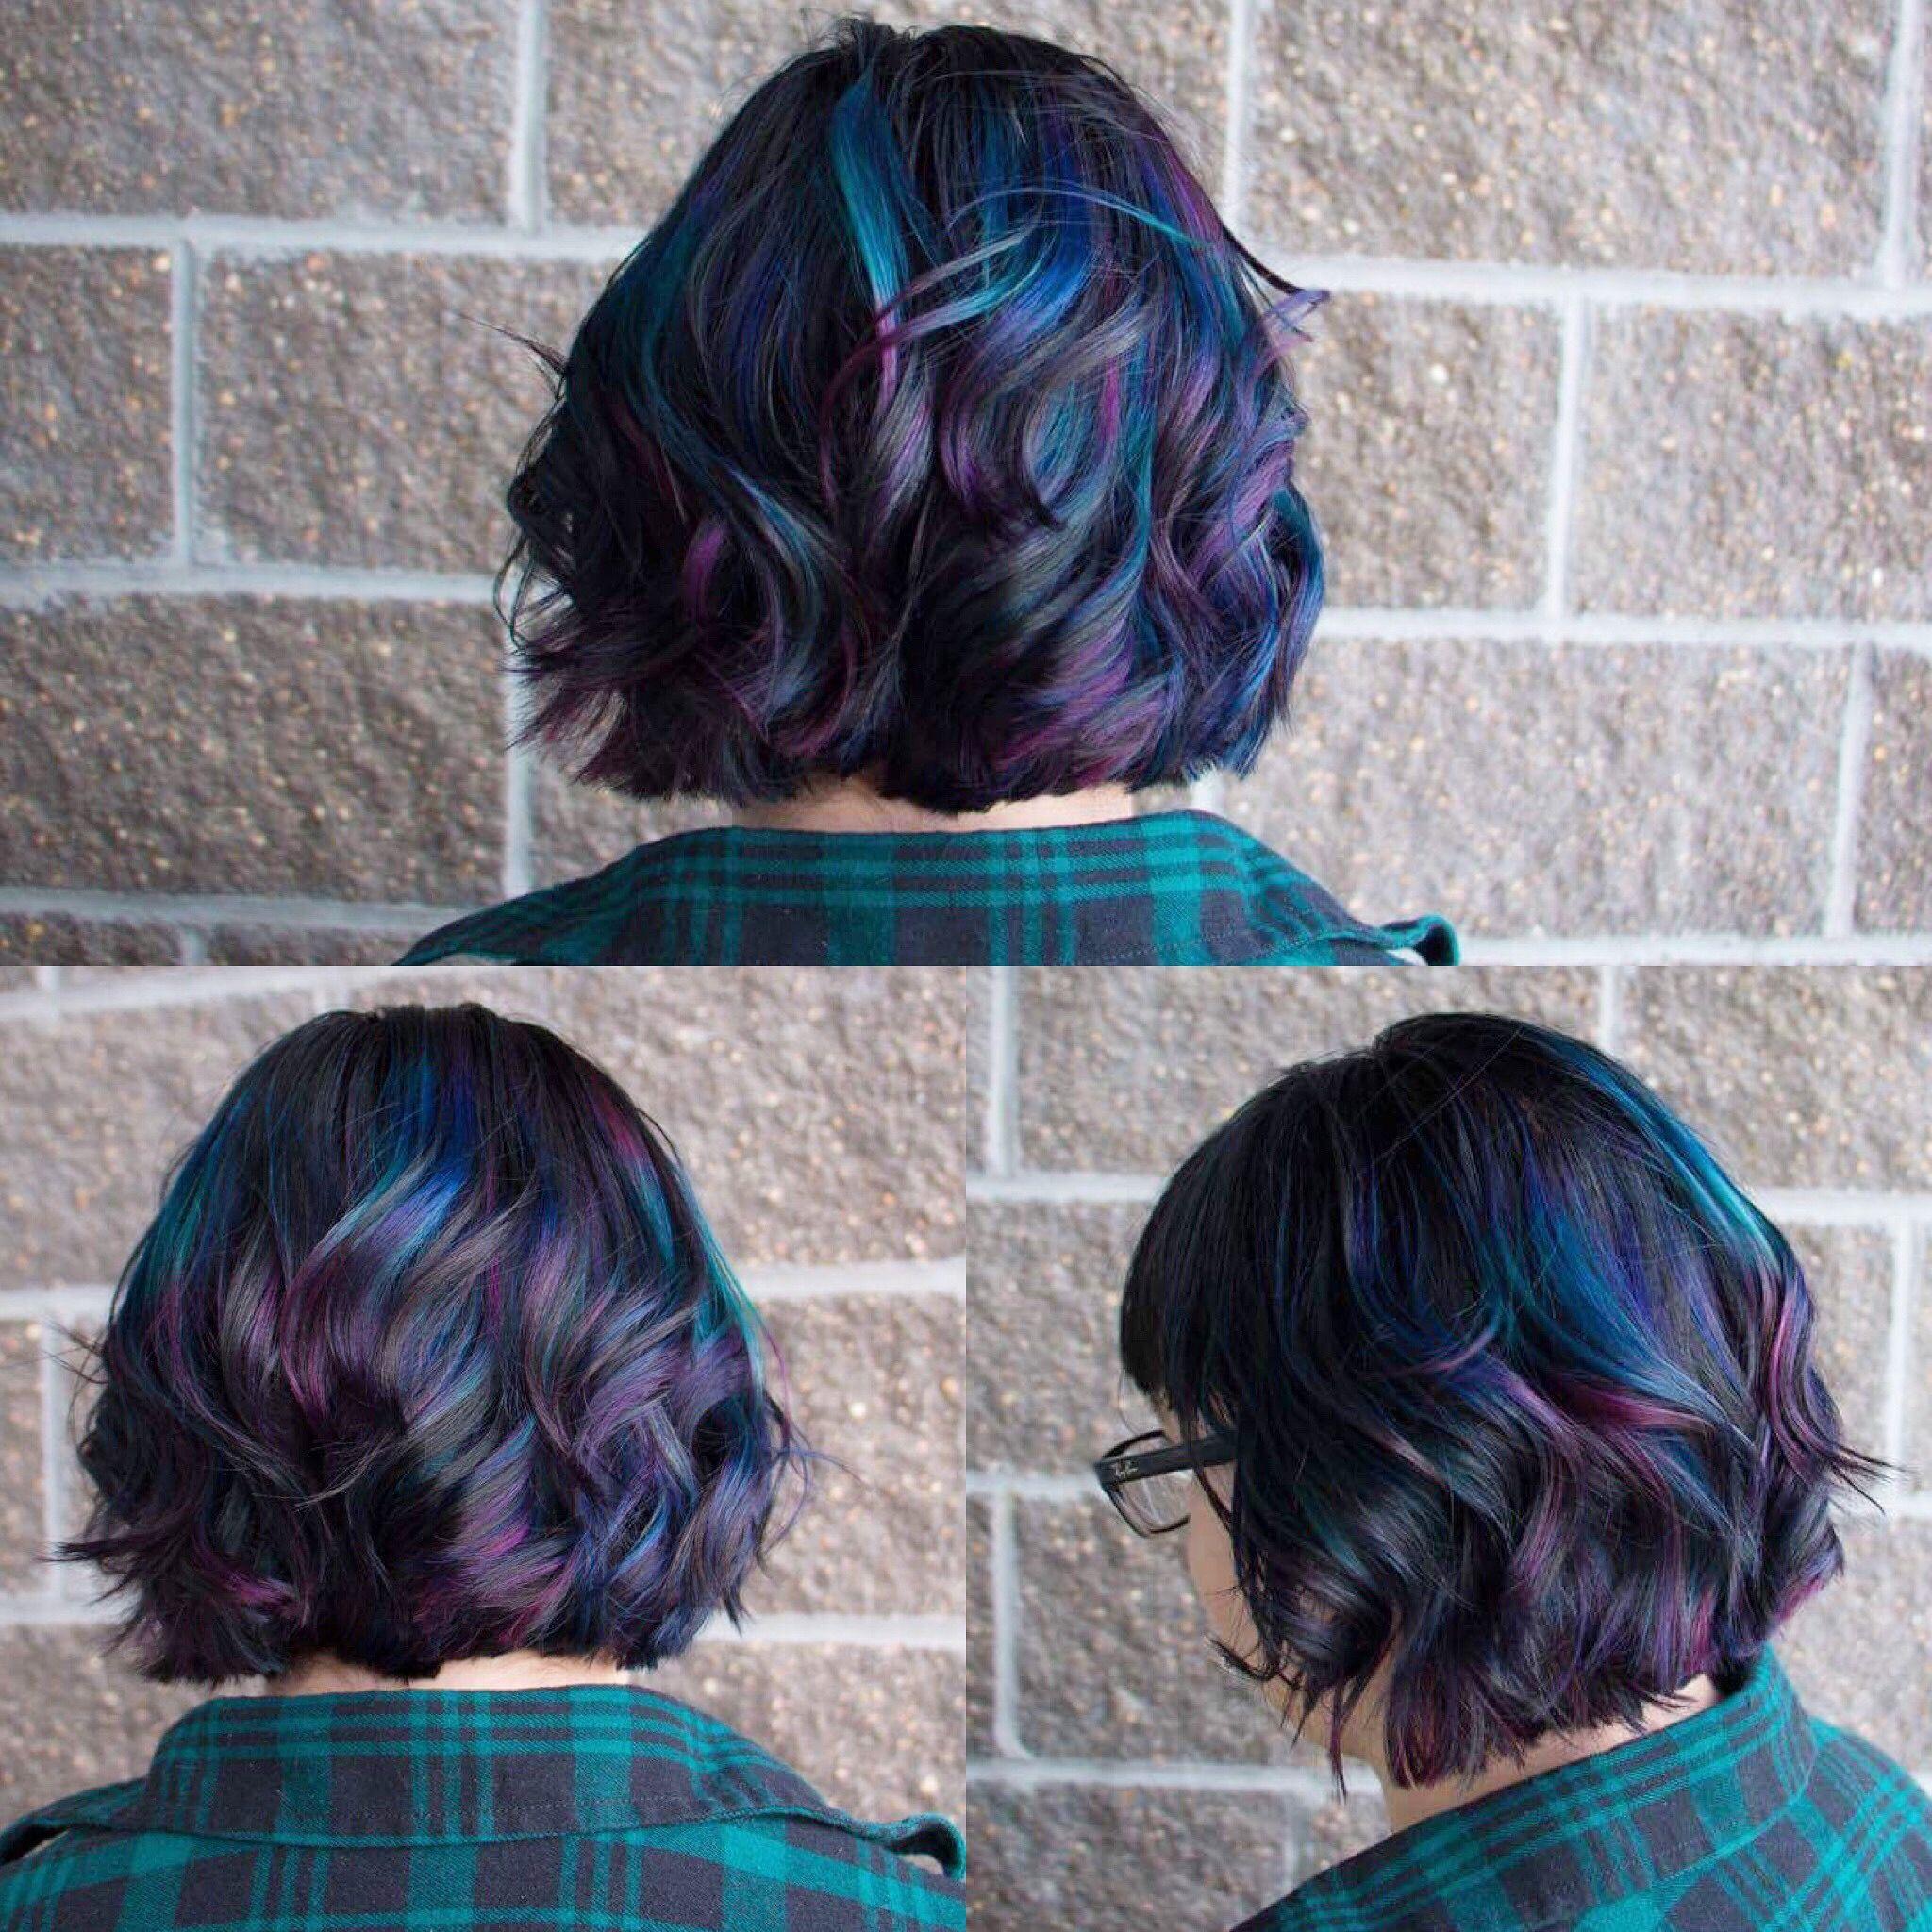 Oil slick hair oilslick hair shorthair darkhair coloredhair